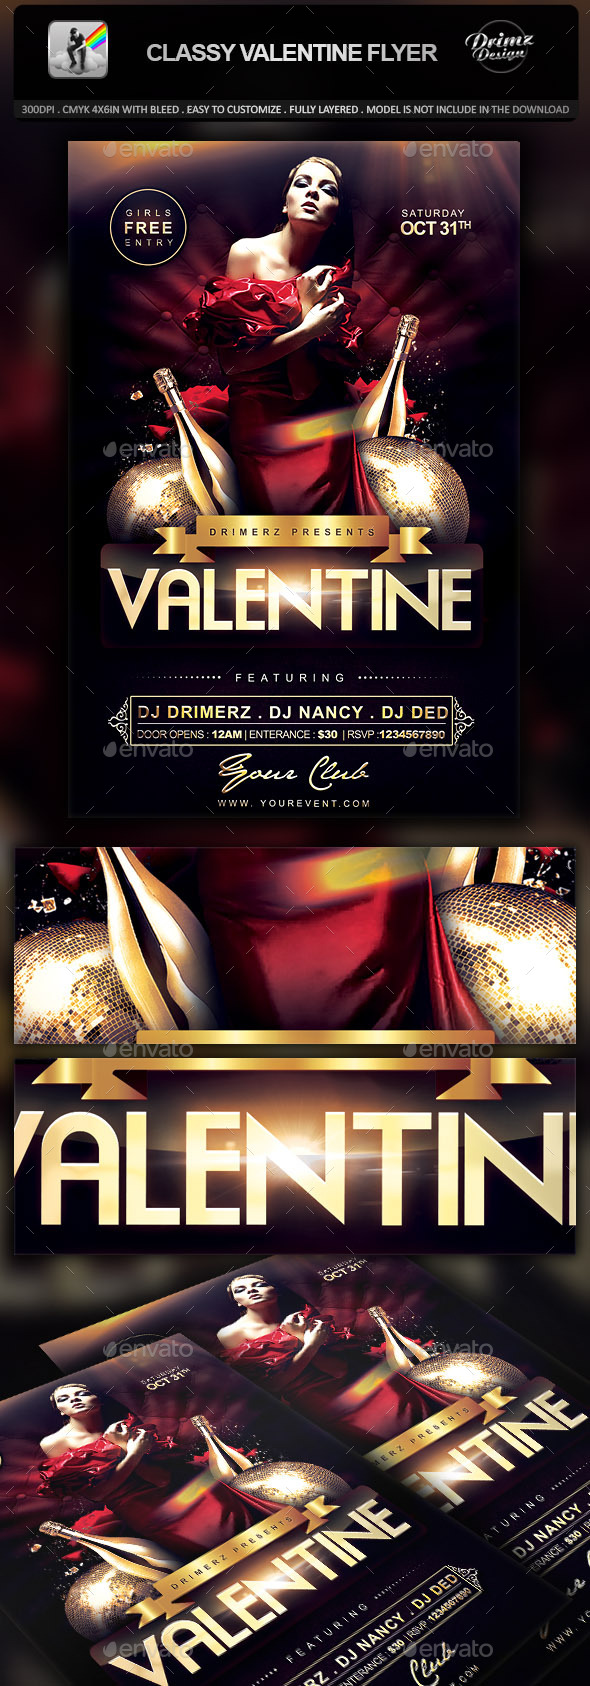 GraphicRiver Classy Valentine Flyer 10041215